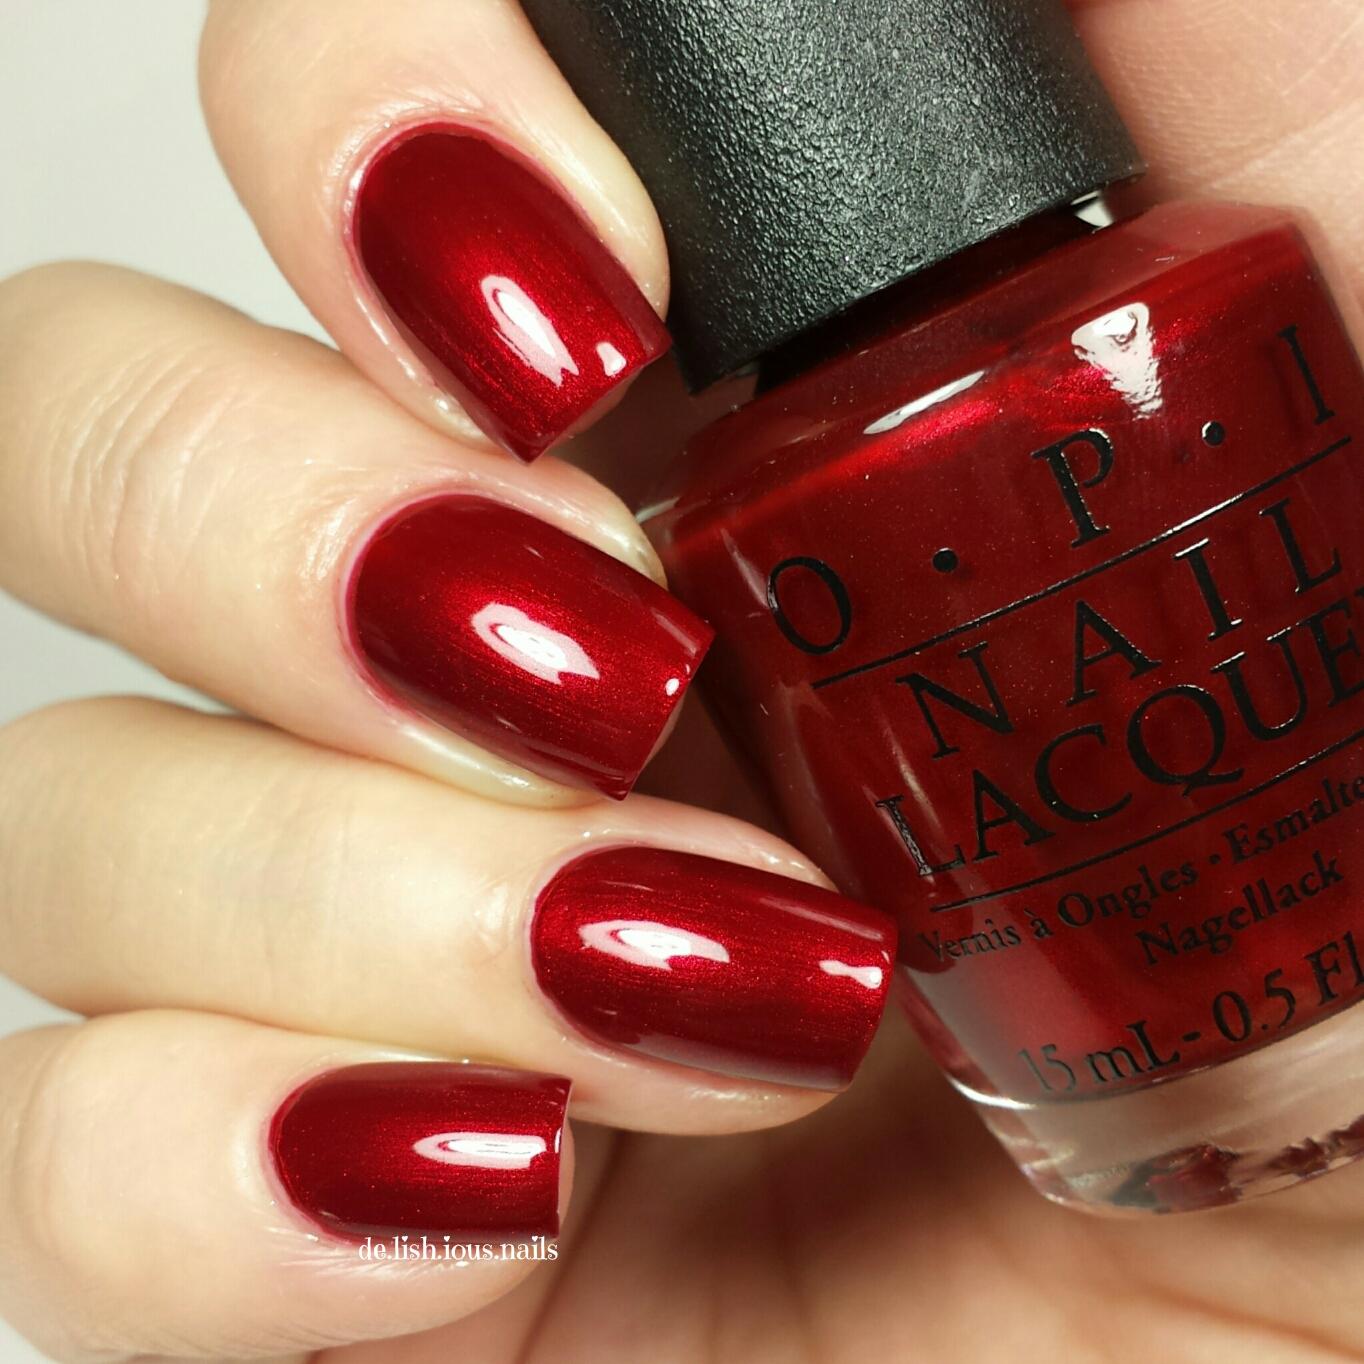 Opi Starlight De Lish Ious Nails